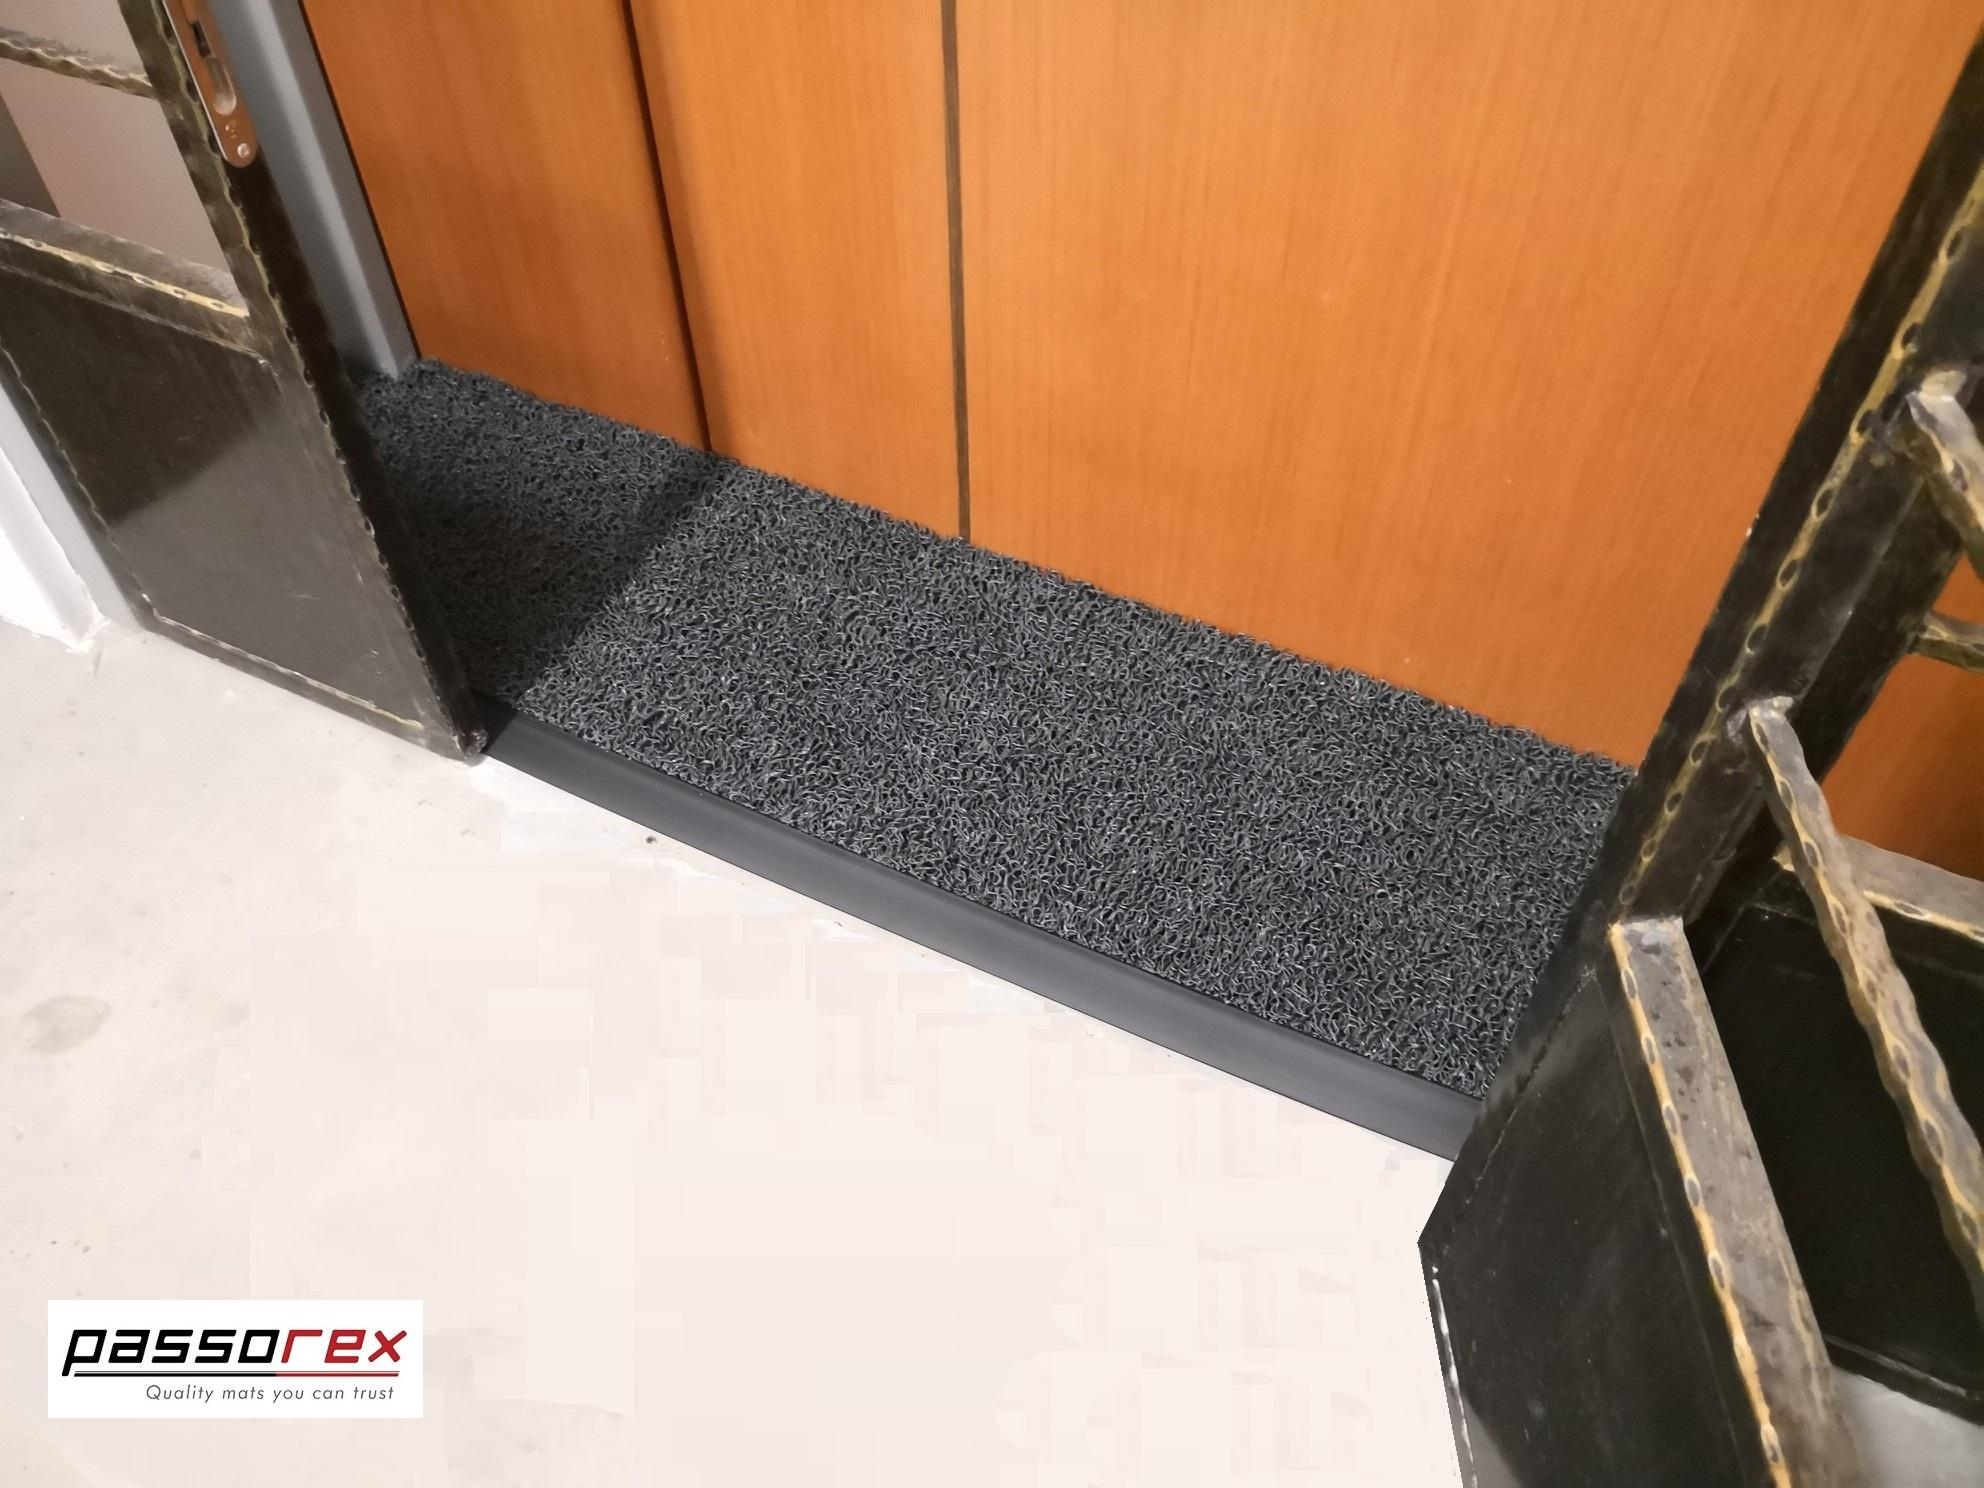 Passorex BTO HDB Door Gap Floor Mat   L120cm x 29cm @ L125cm x 27cm   Mat thickness T16mm+/-   Dark Grey